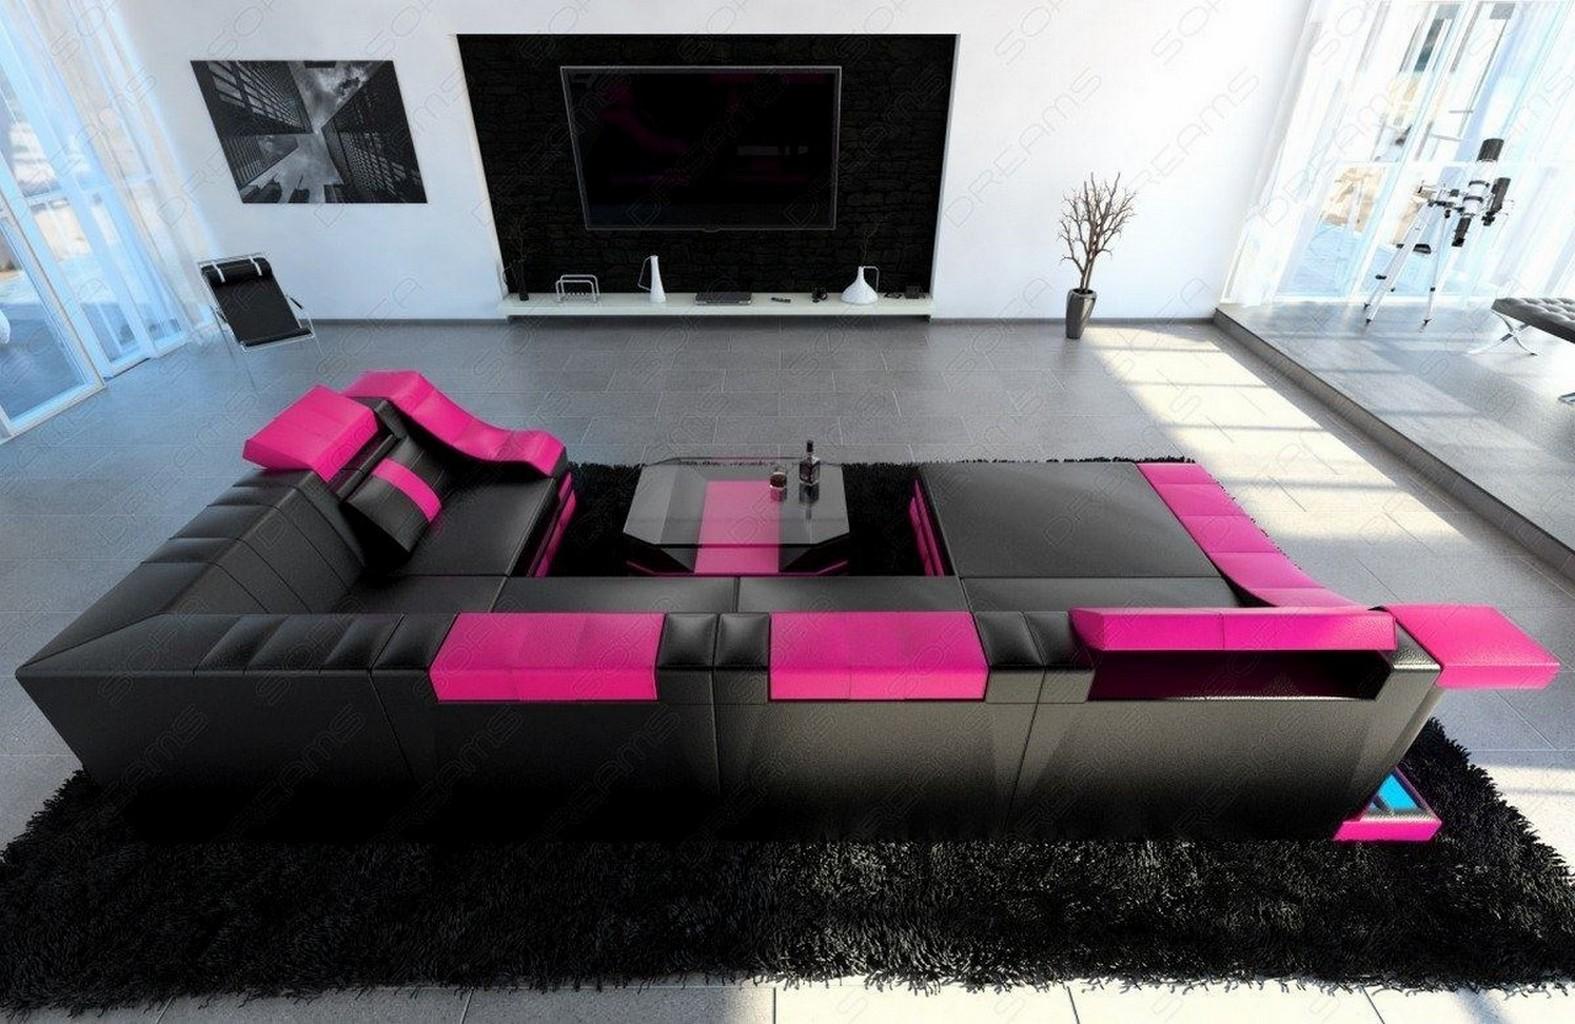 eckcouch luxus sofa turino led beleuchtung wohnlandschaft. Black Bedroom Furniture Sets. Home Design Ideas